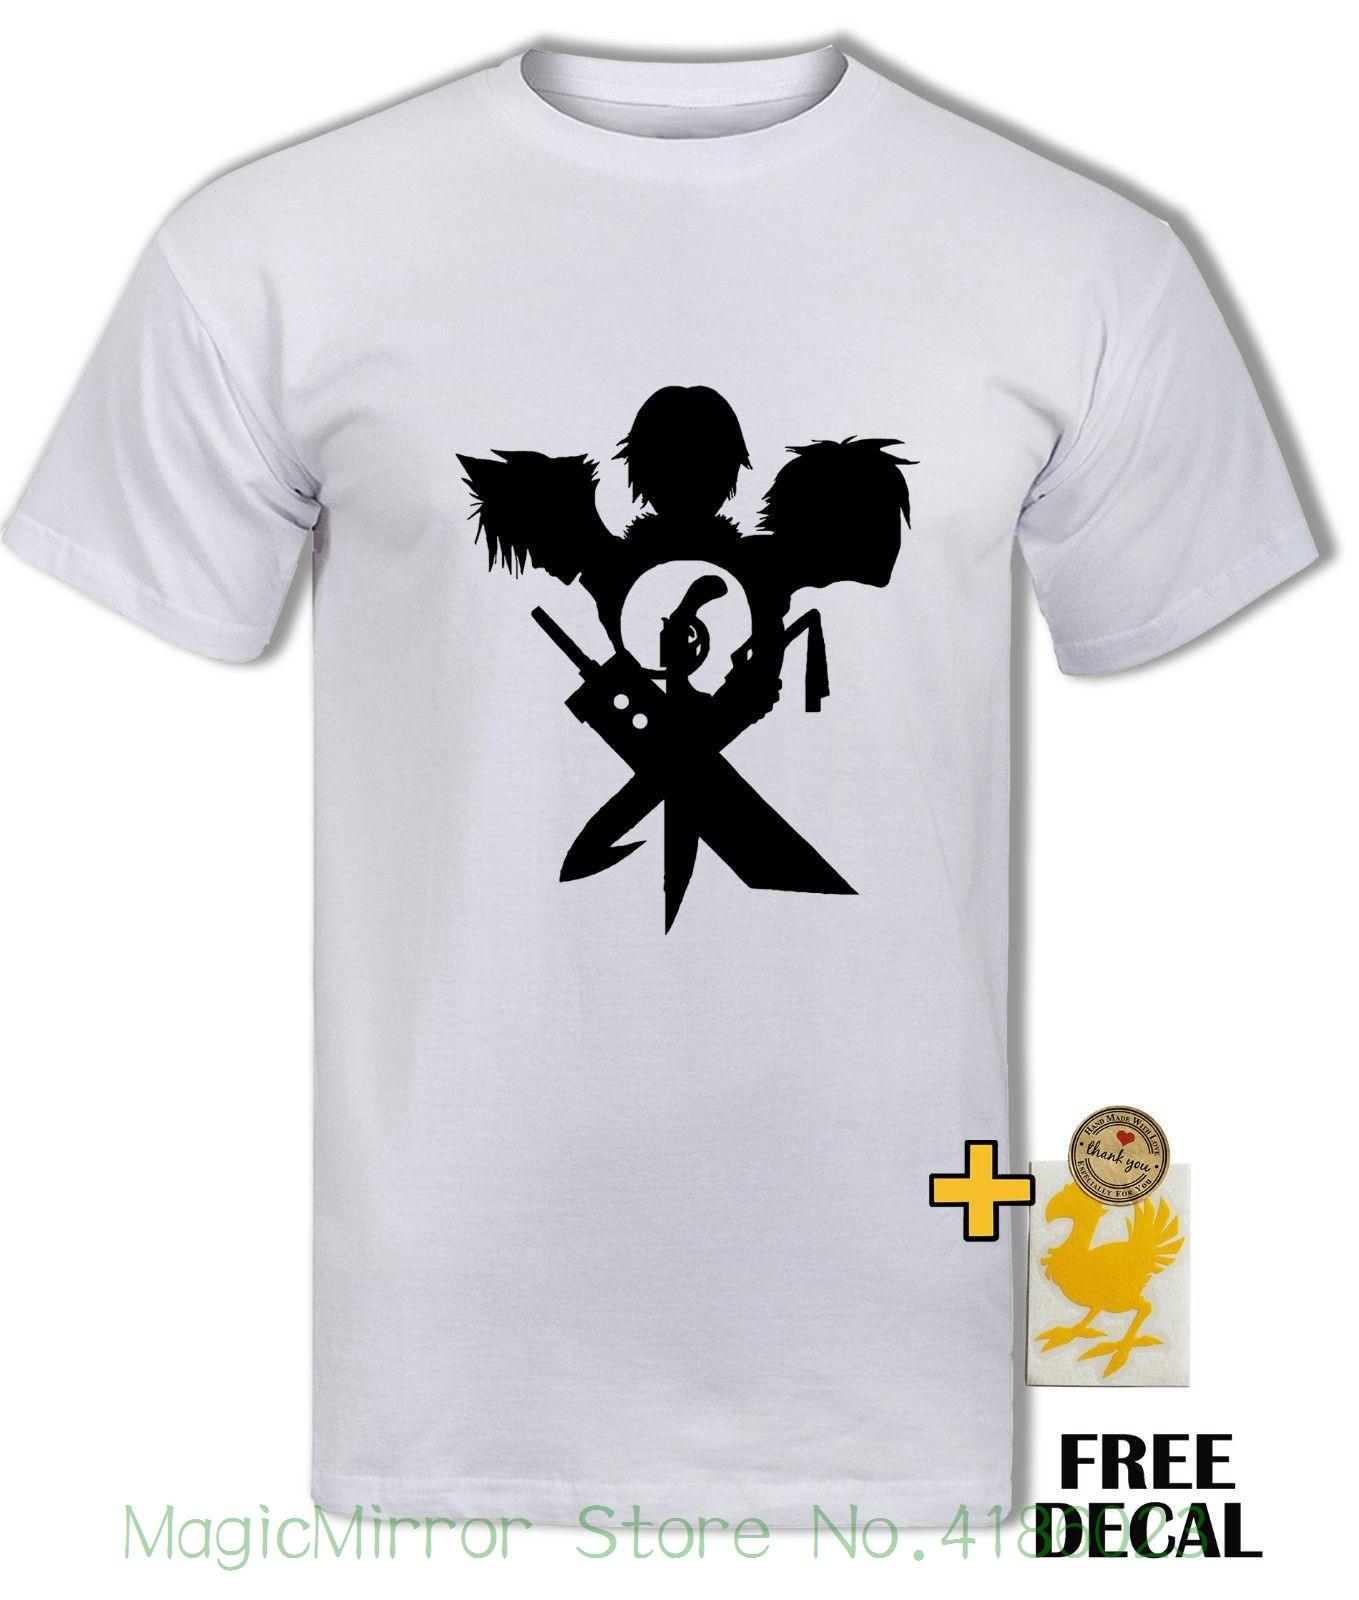 Großhandel Final Fantasy T Shirt Wolke Squall Tidus Schwerter Ff7 Ff9 Ff10,  Gamer T Shirt Herren Herren T Shirts Sommer Hipster Von Magicmirrorstore,  ... 6b93e3ab57